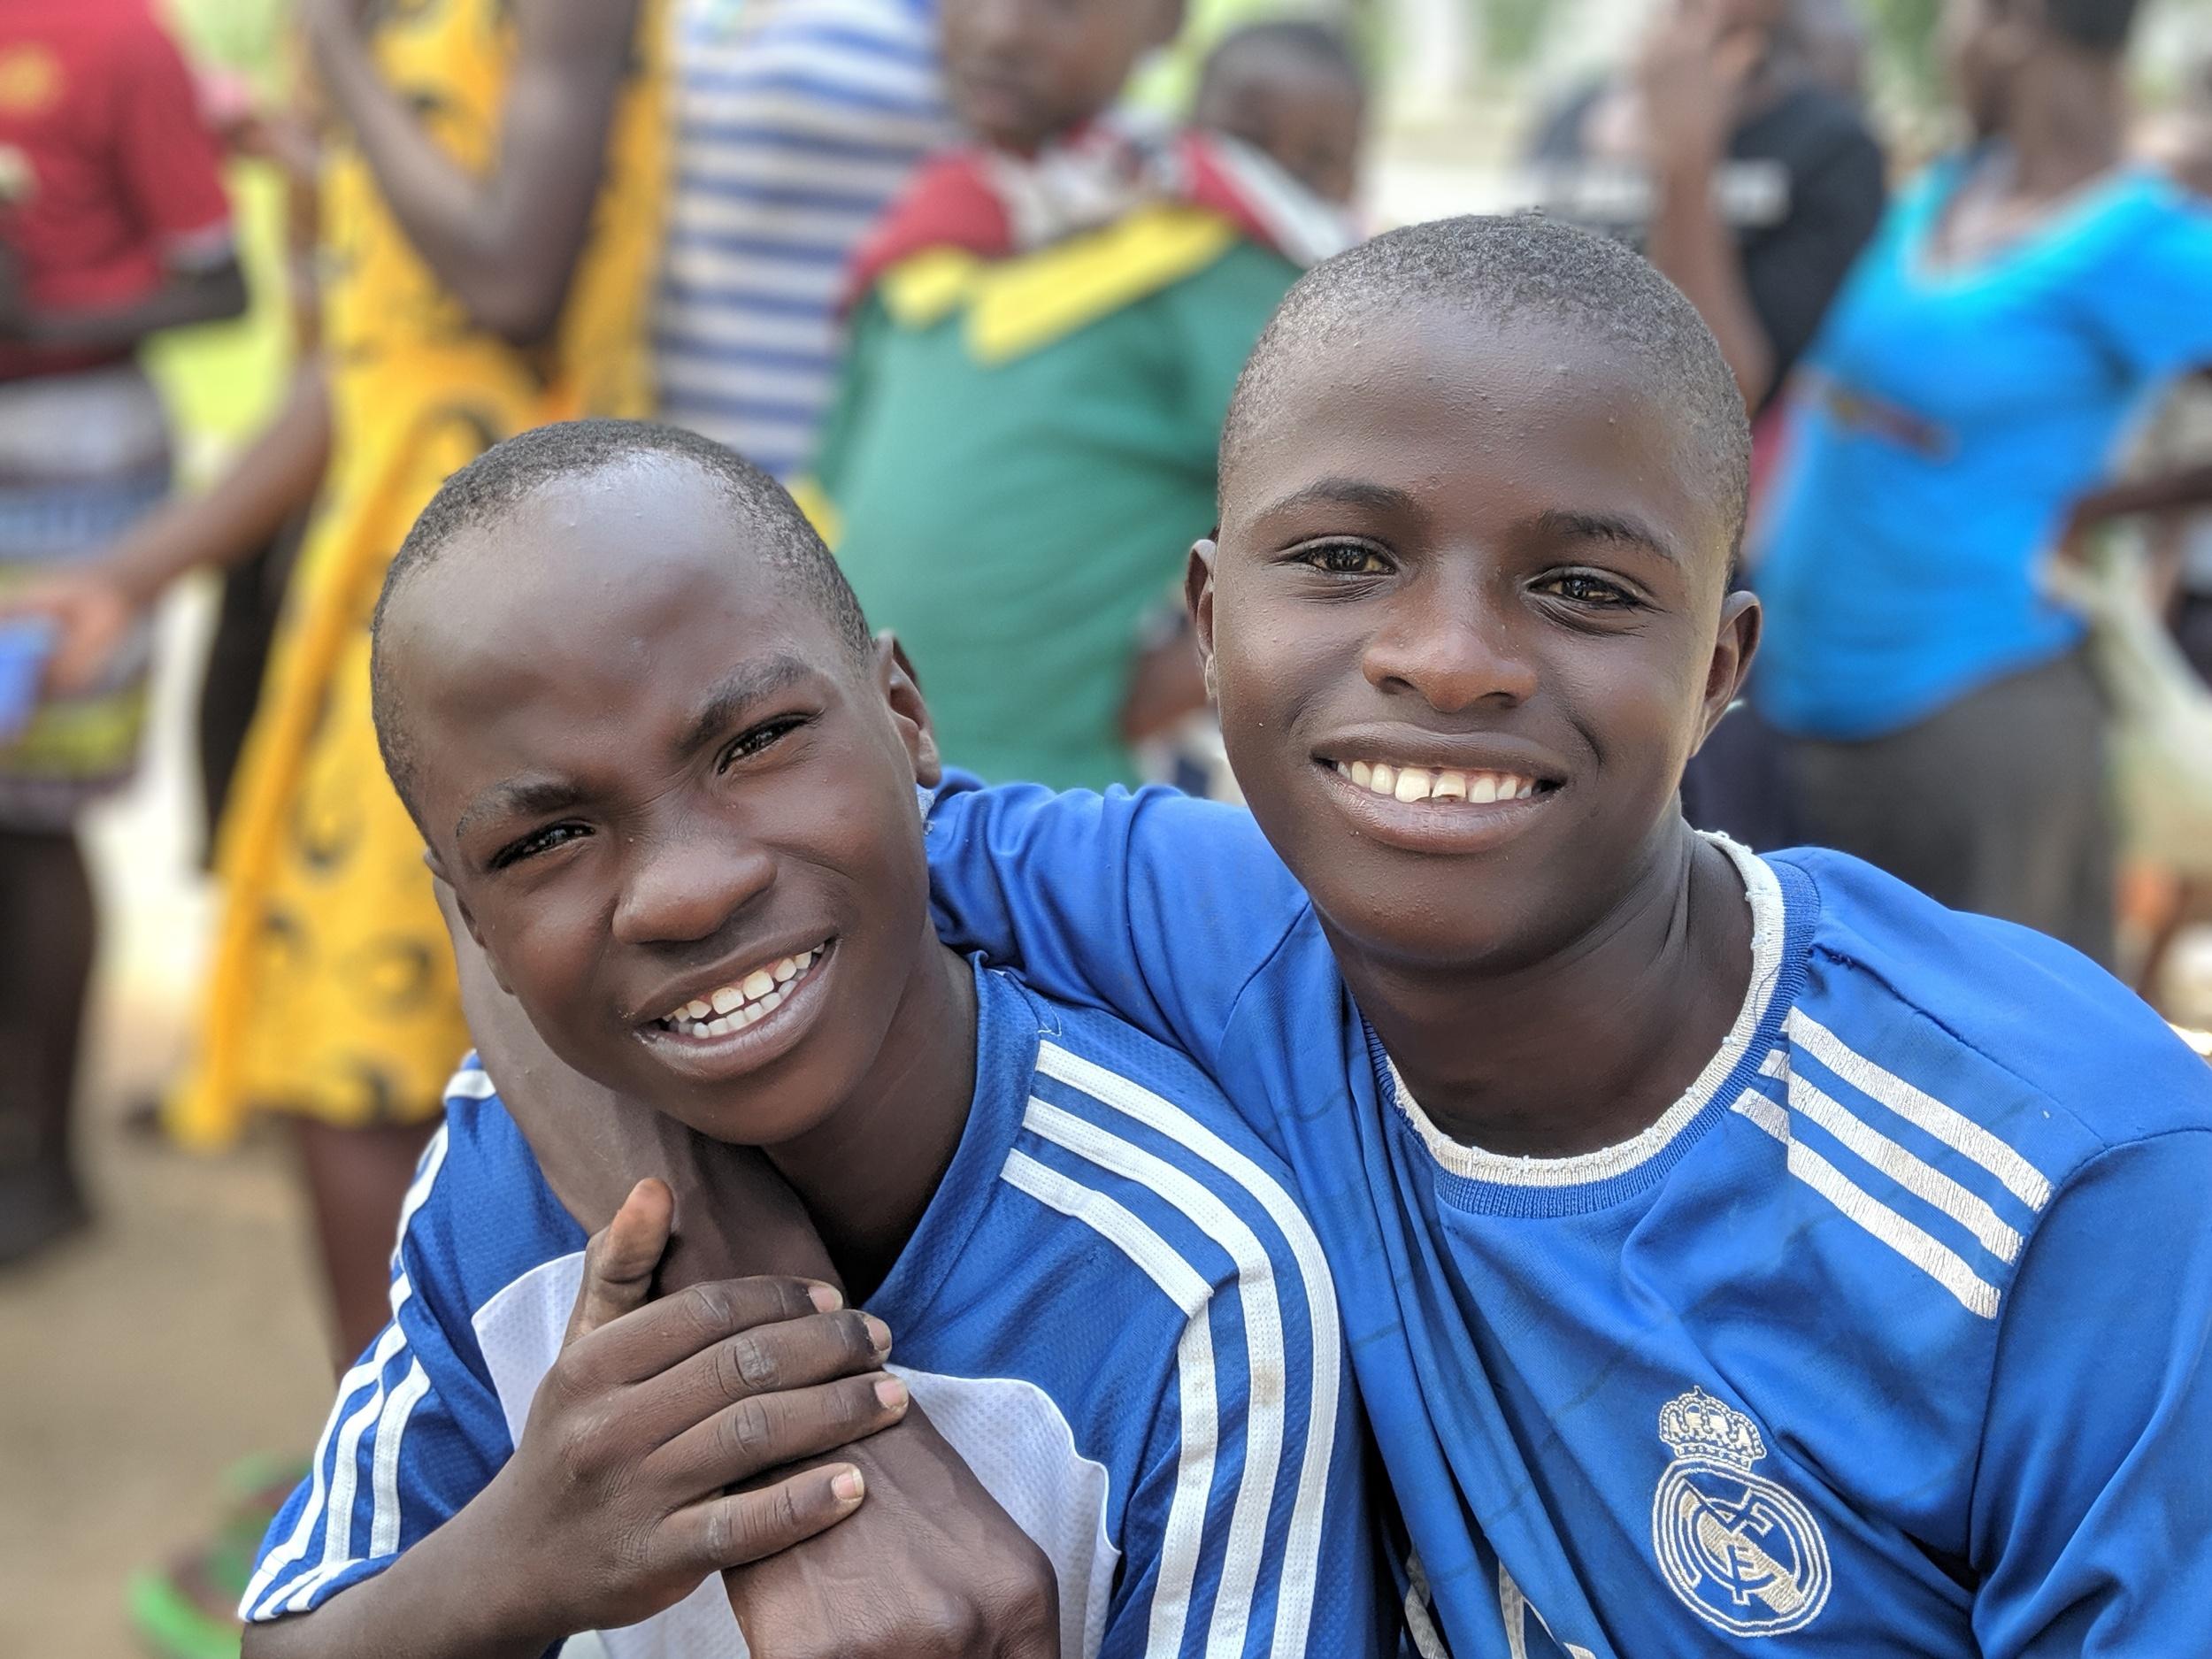 This picture was taken in June of 2019 💙💙💙. Danny Chapia and Dan Kamau